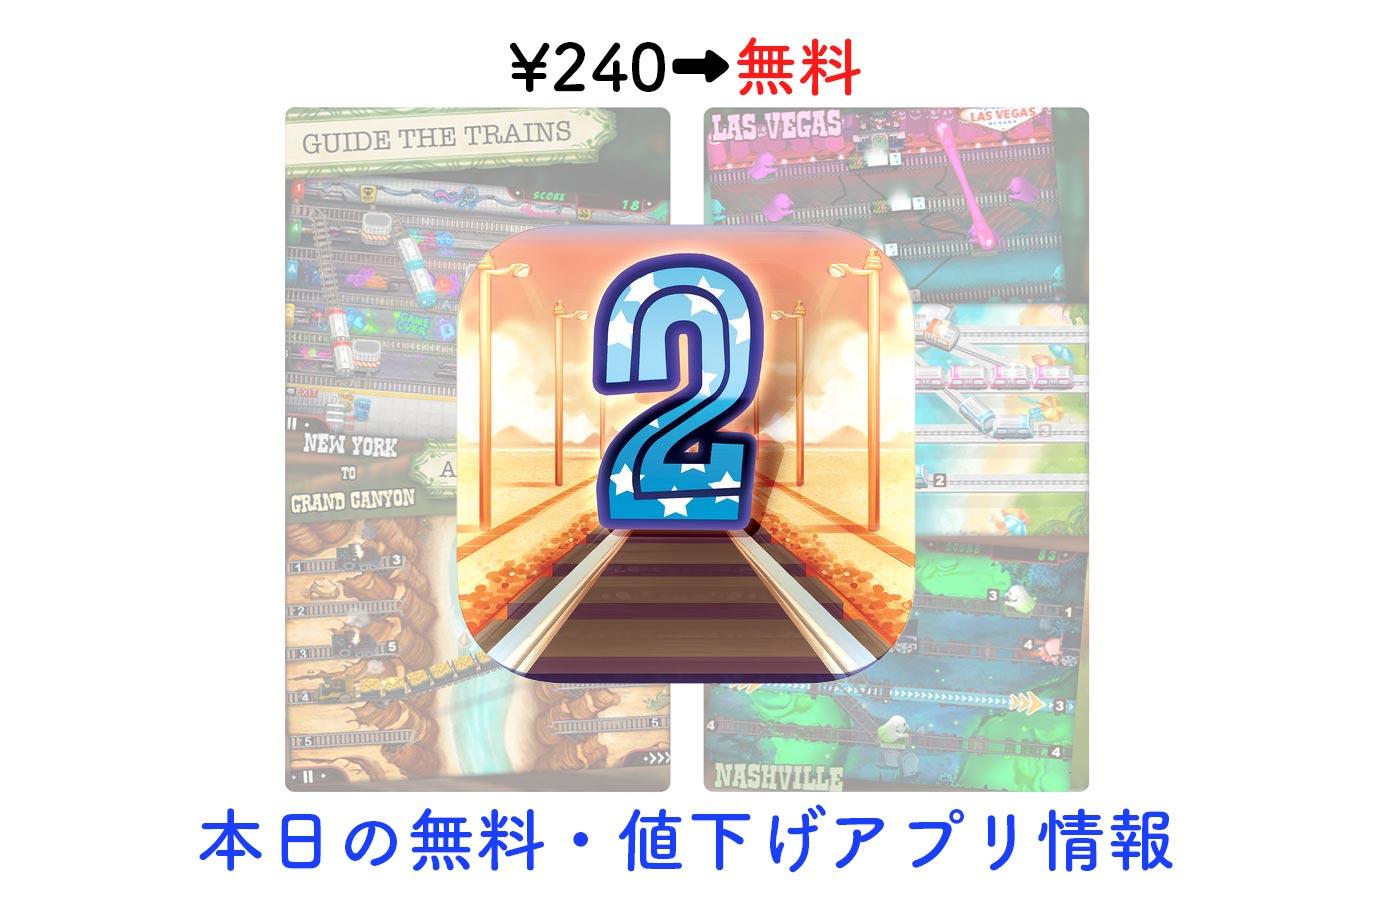 Appsale0420